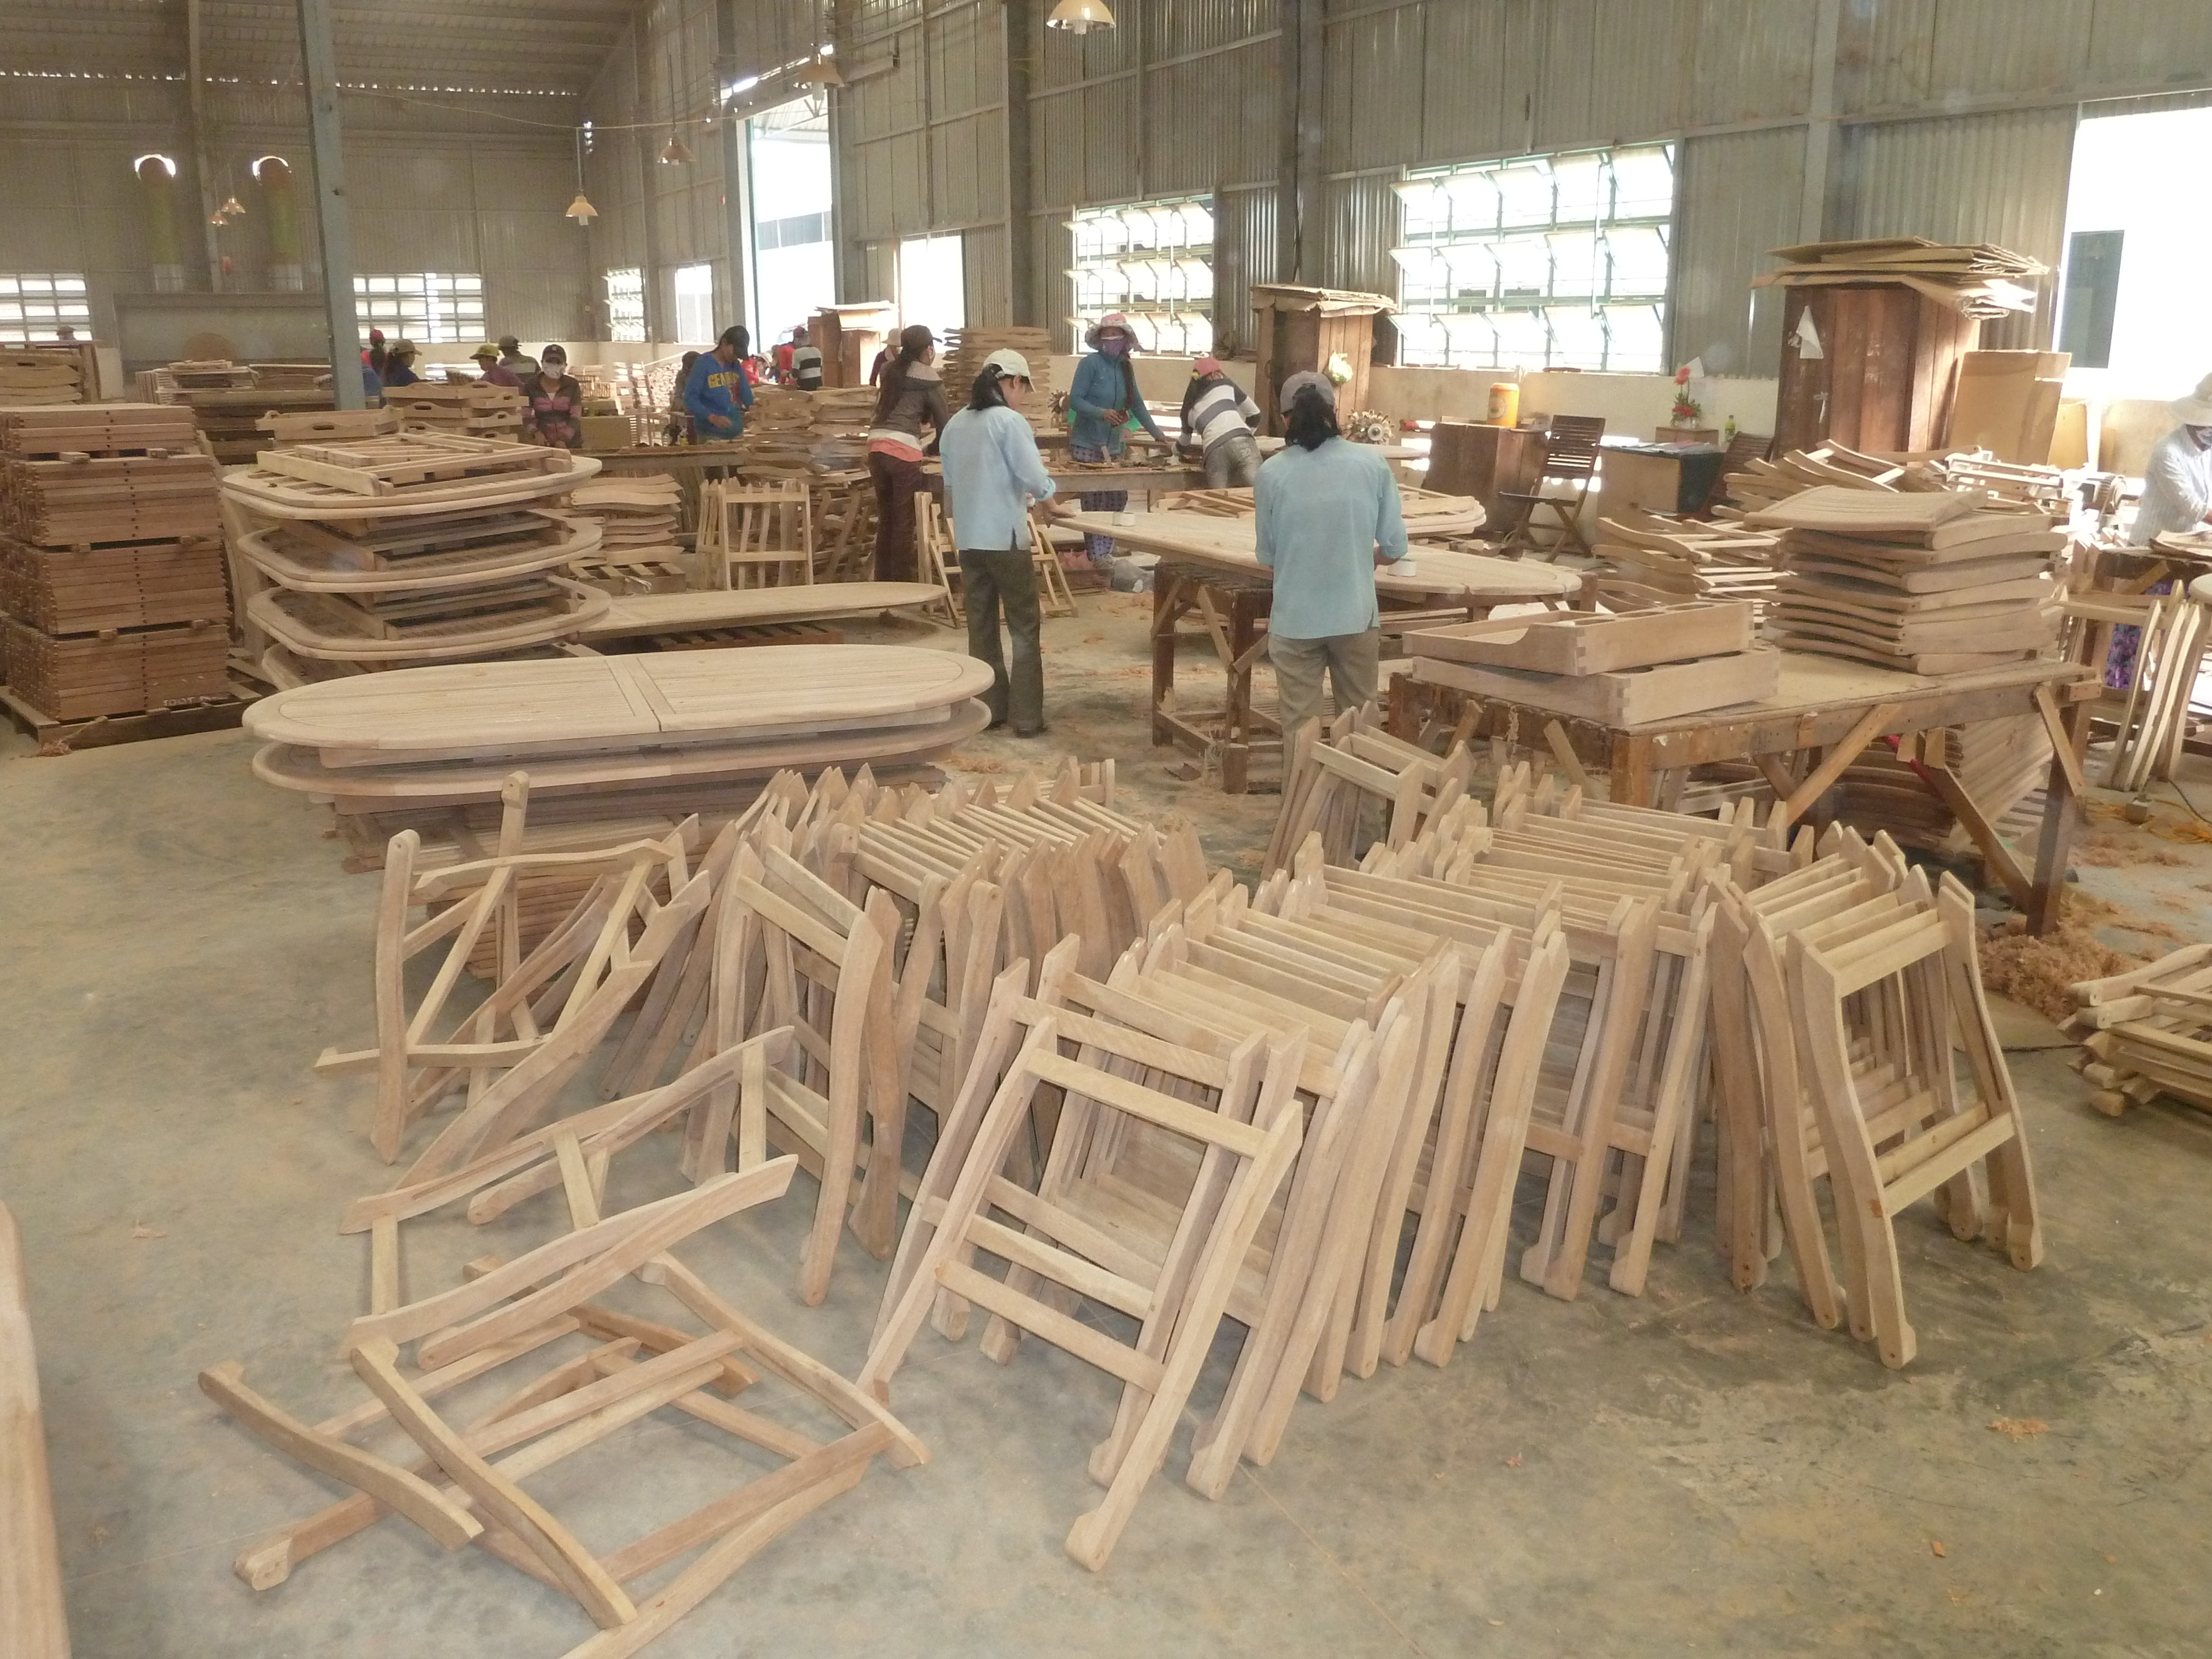 outdoor furniture factory qui nhon vietnam c eia bush warriors rh bushwarriors wordpress com outdoor furniture factory whatley al outdoor furniture factory outlet brisbane